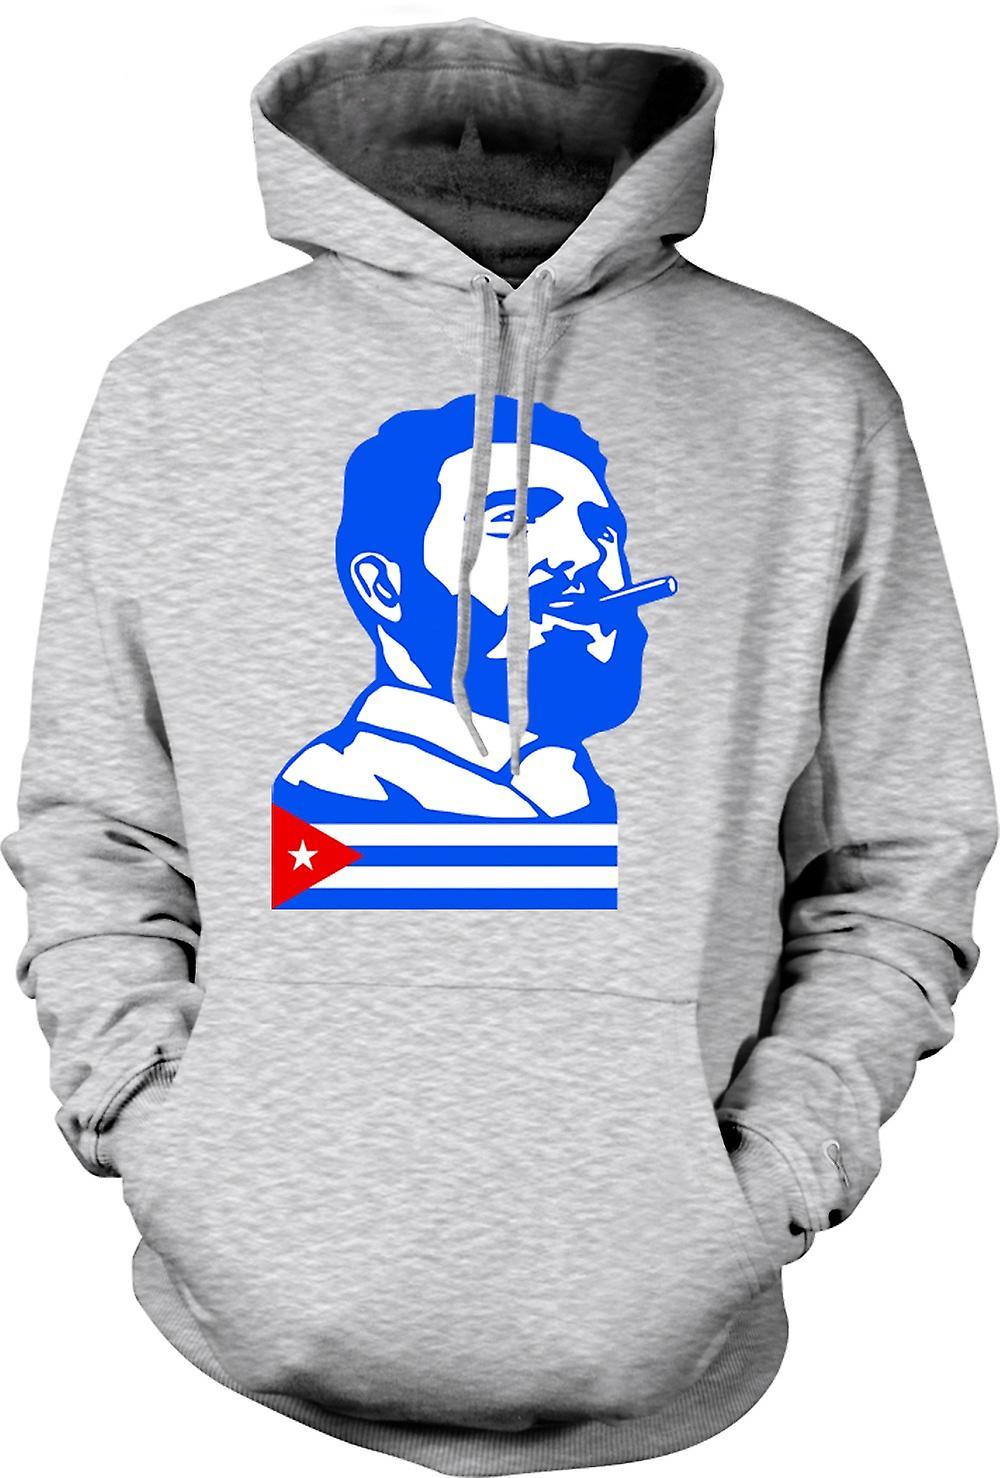 Mens Hoodie - Fidel Castro - Cuba